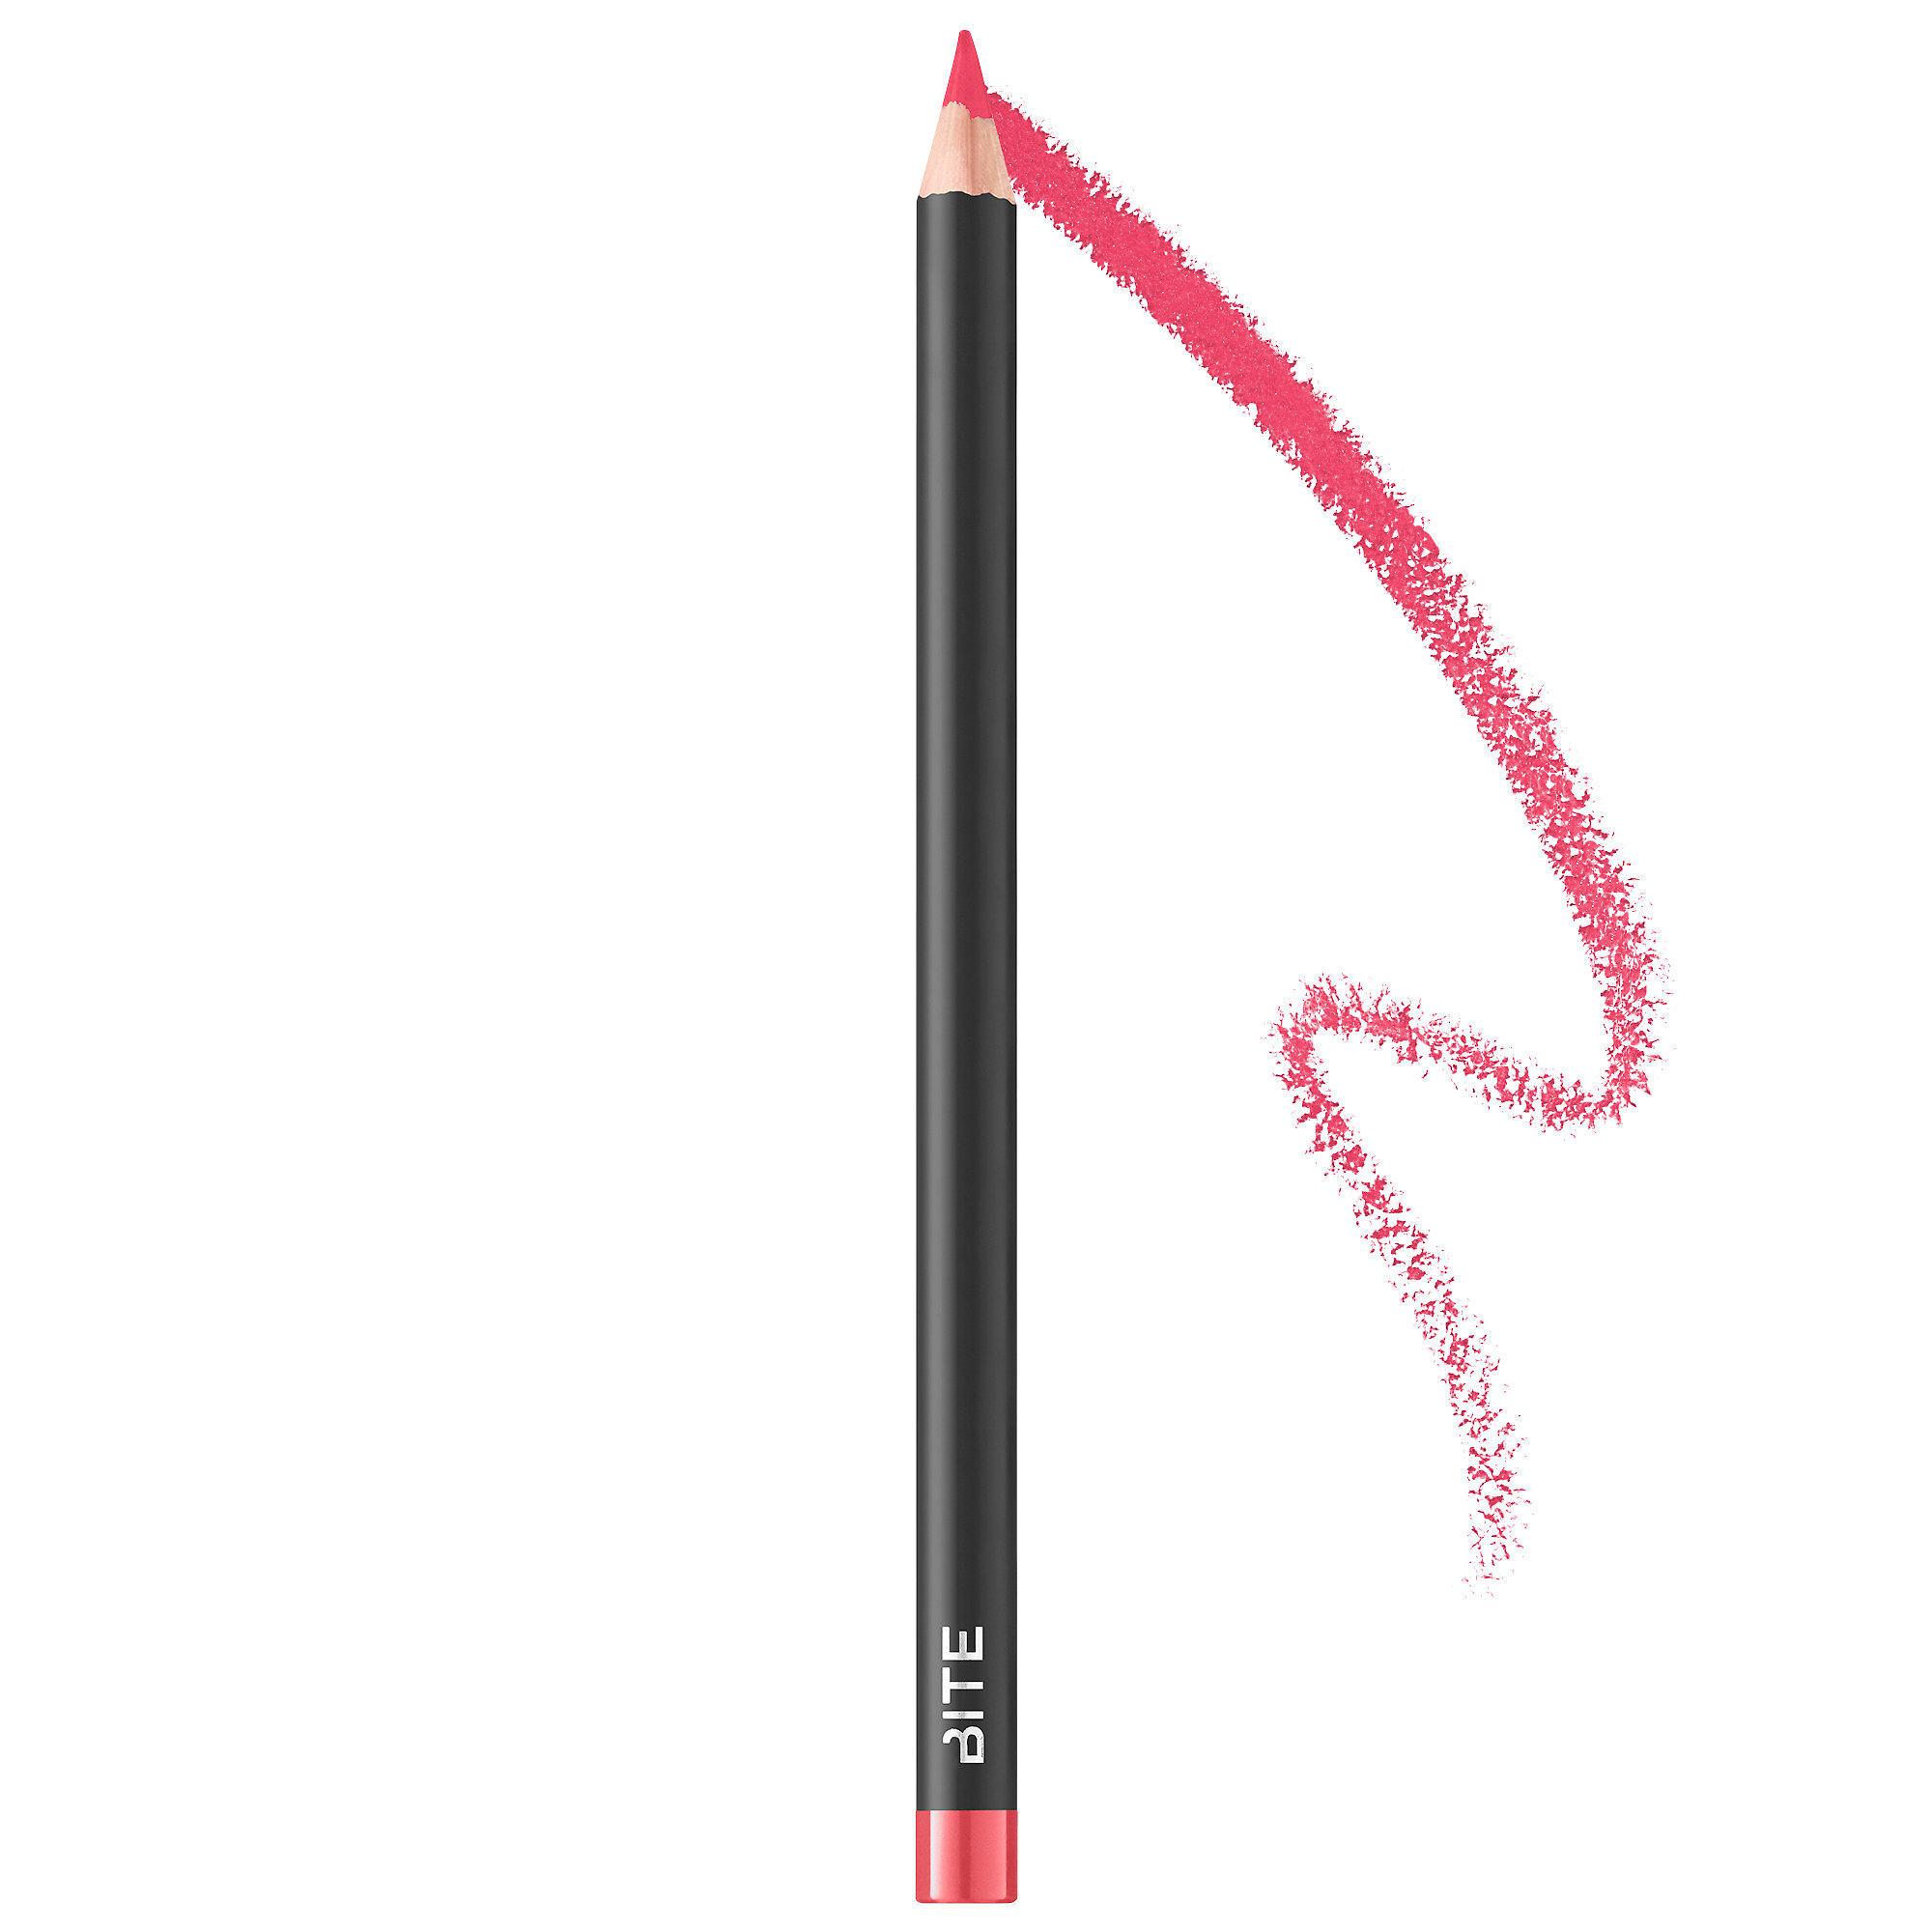 Bite Beauty The Lip Pencil Electric Coral 070